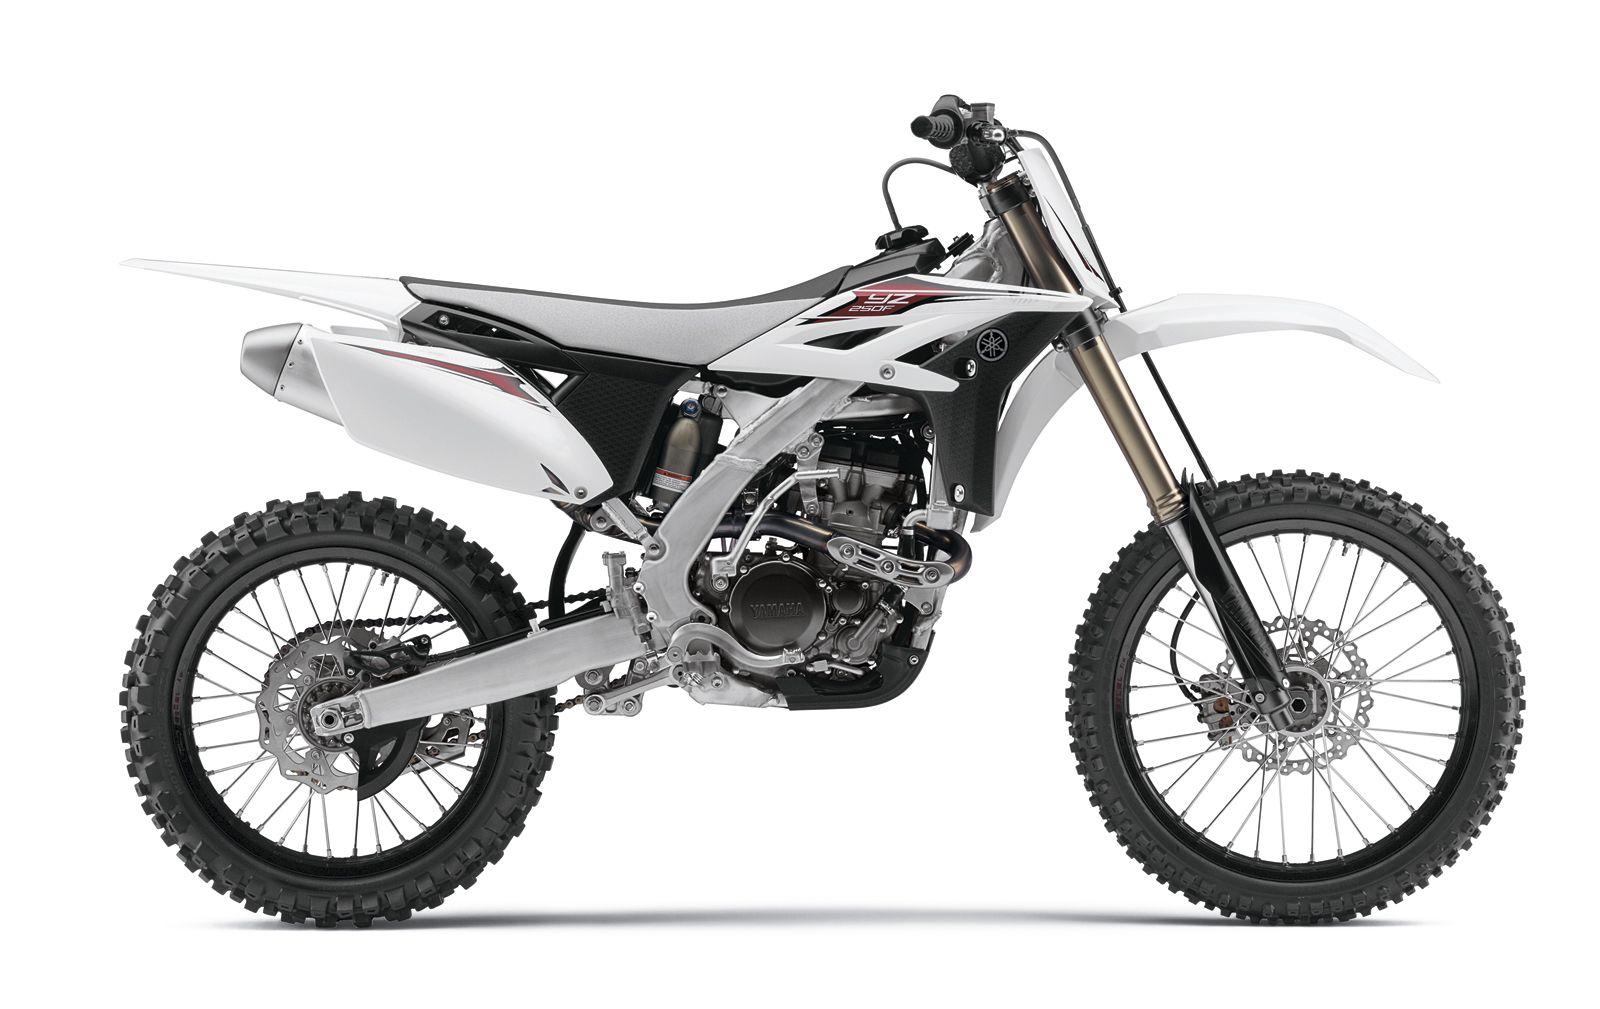 Yamaha Yzf250 Or Buy White Plastics Yamaha Bike Toy Dirt Scooter